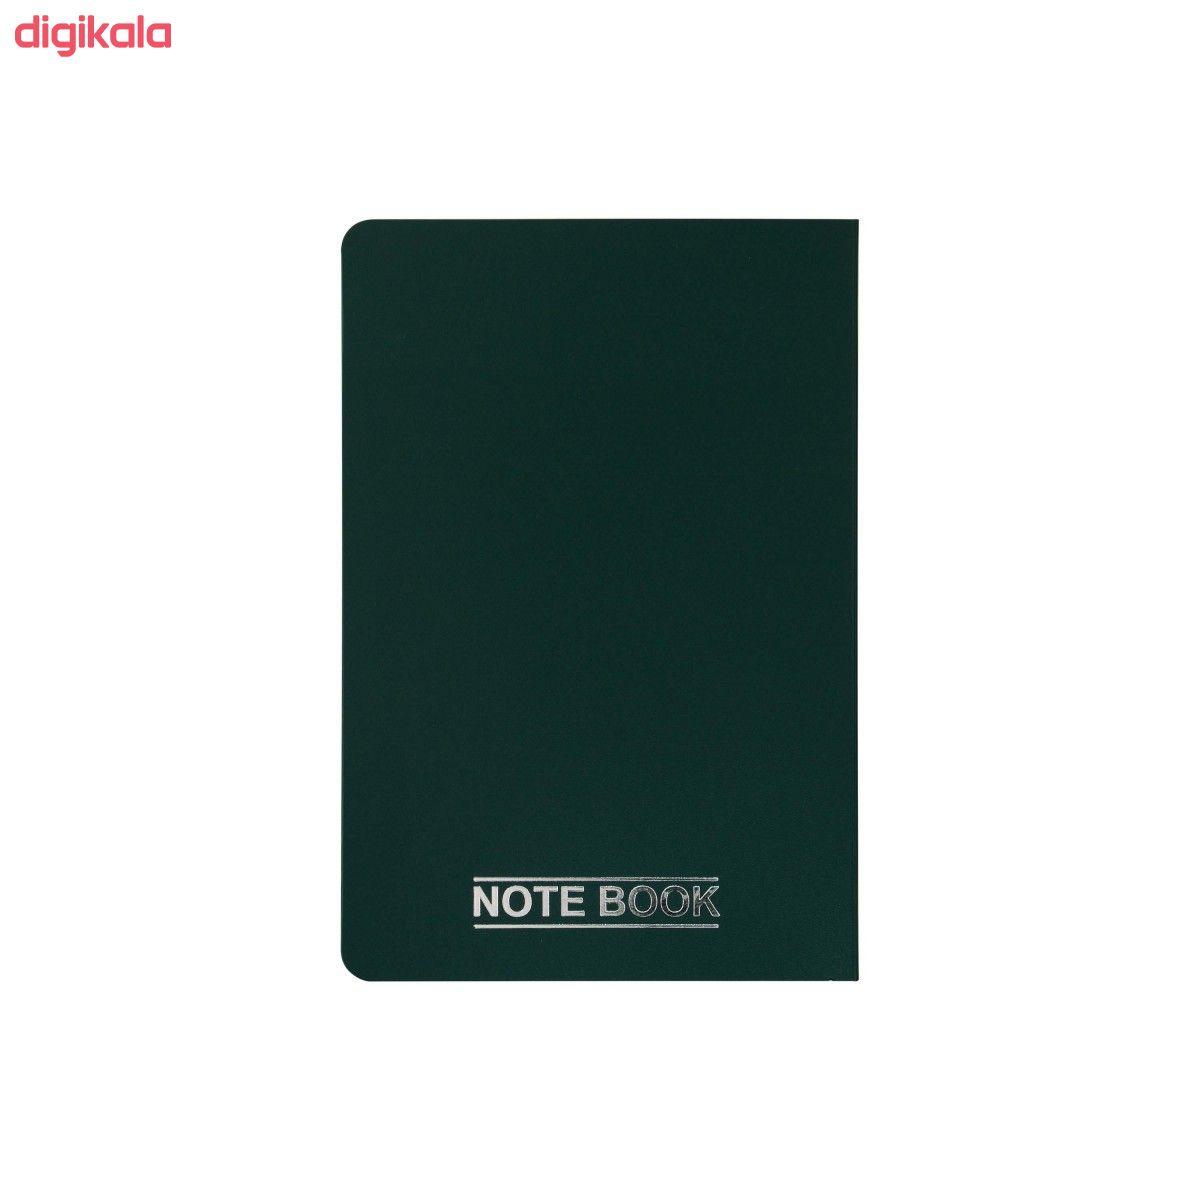 دفتر یادداشت 120 برگ پاپکو مدل  NB-638 کد HT01 main 1 10